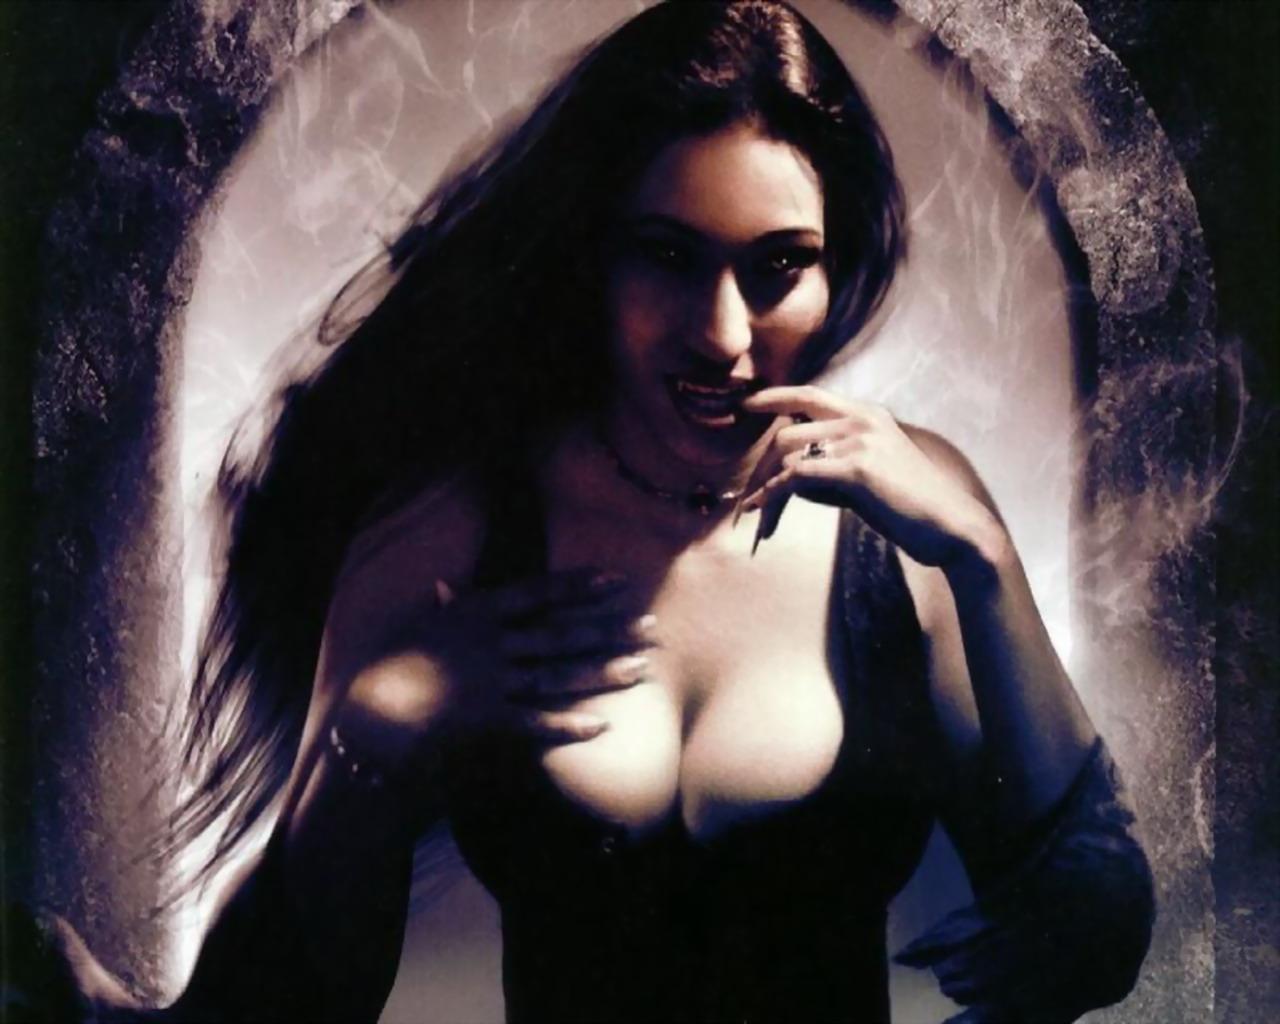 Pron vamp photo smut pussy